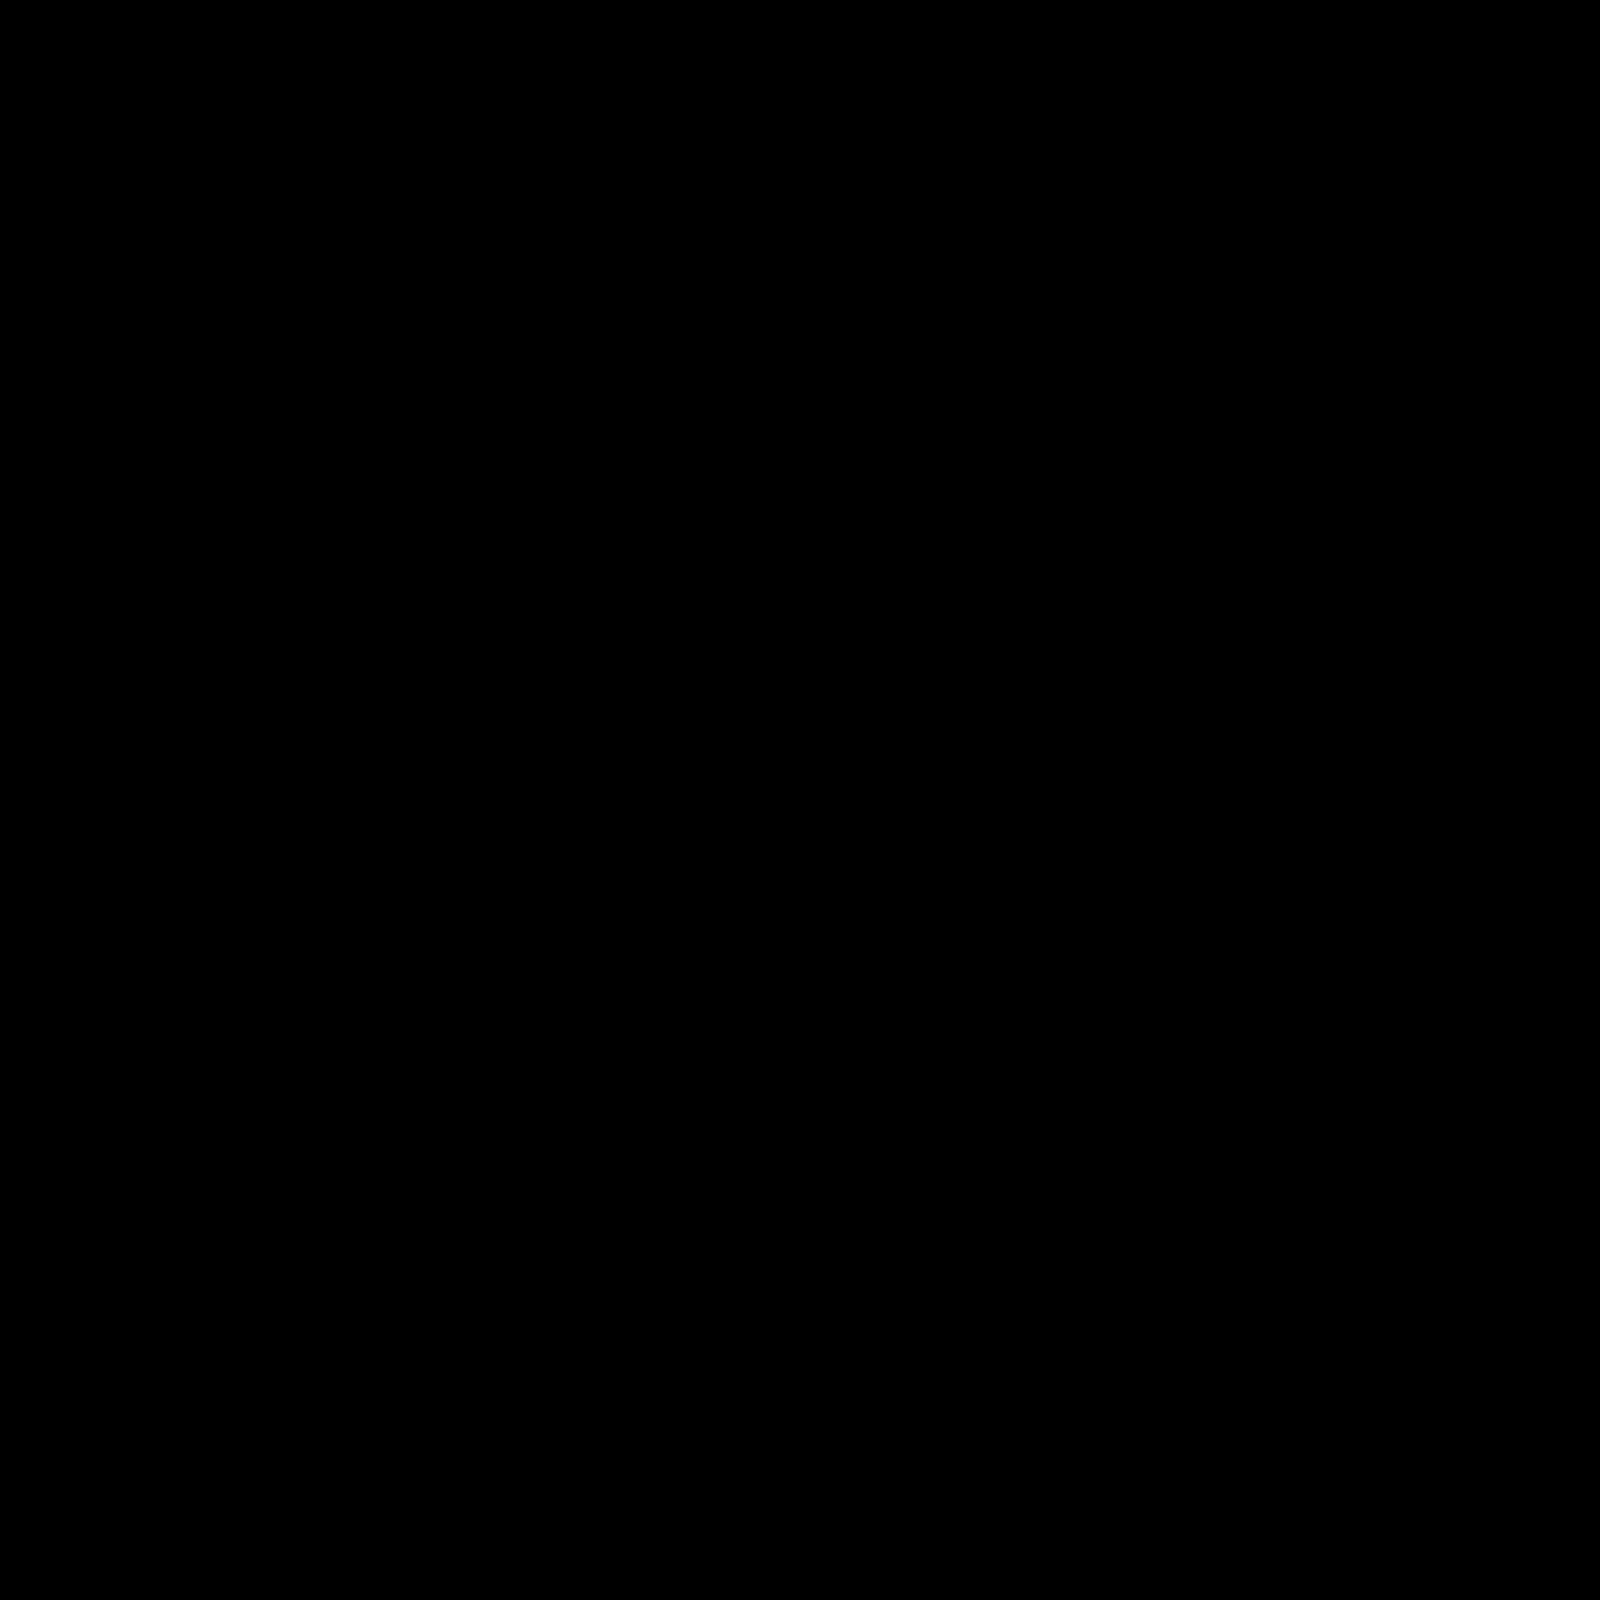 Docker Container icon